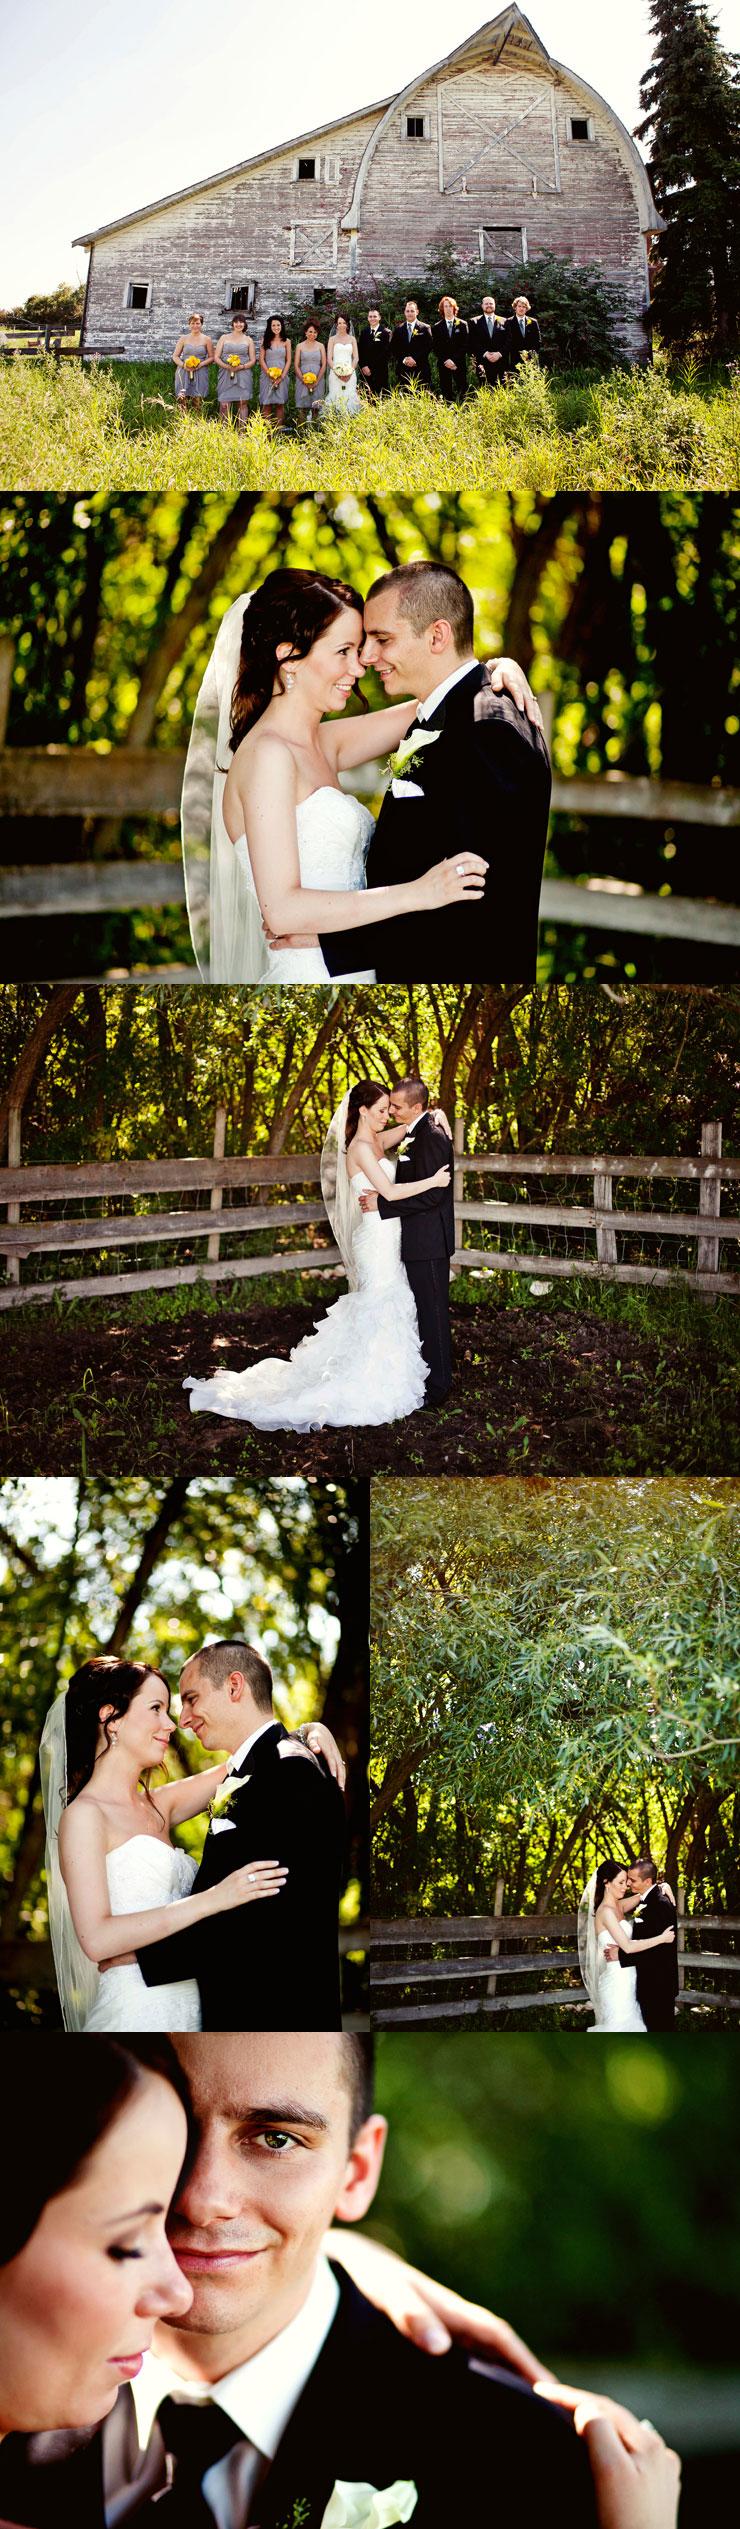 wedding-photograps-edmonton